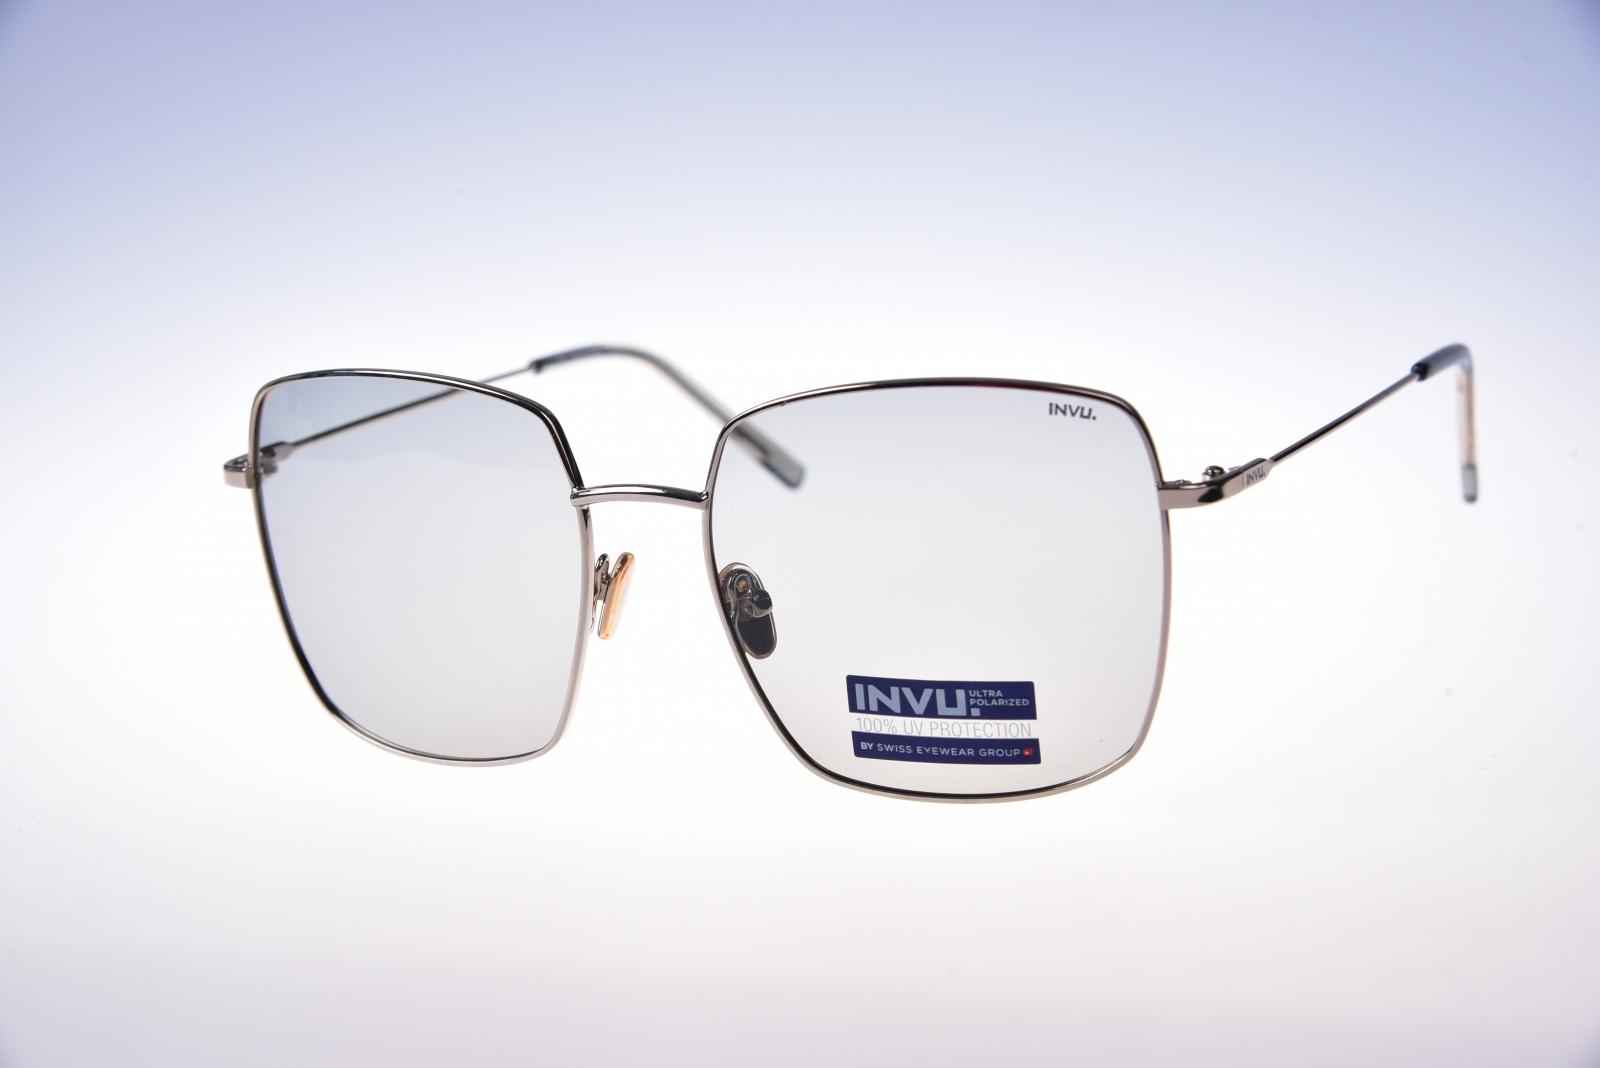 INVU. Trend T1900F - Dámske slnečné okuliare